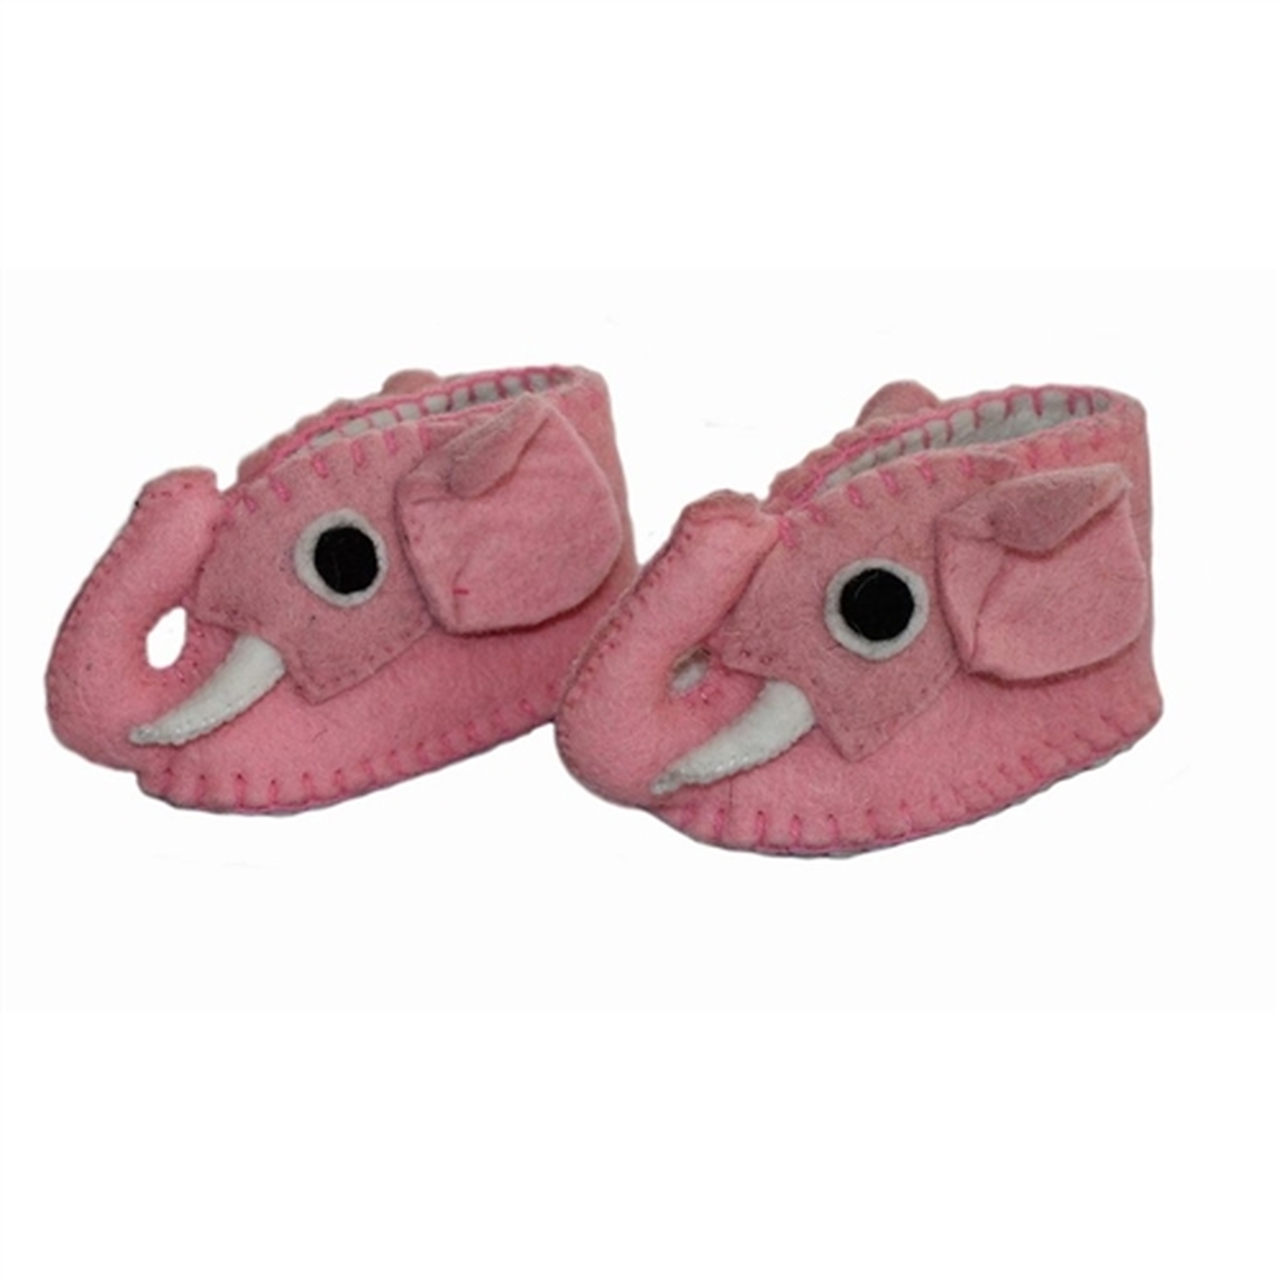 Elephant Baby Booties - PInk